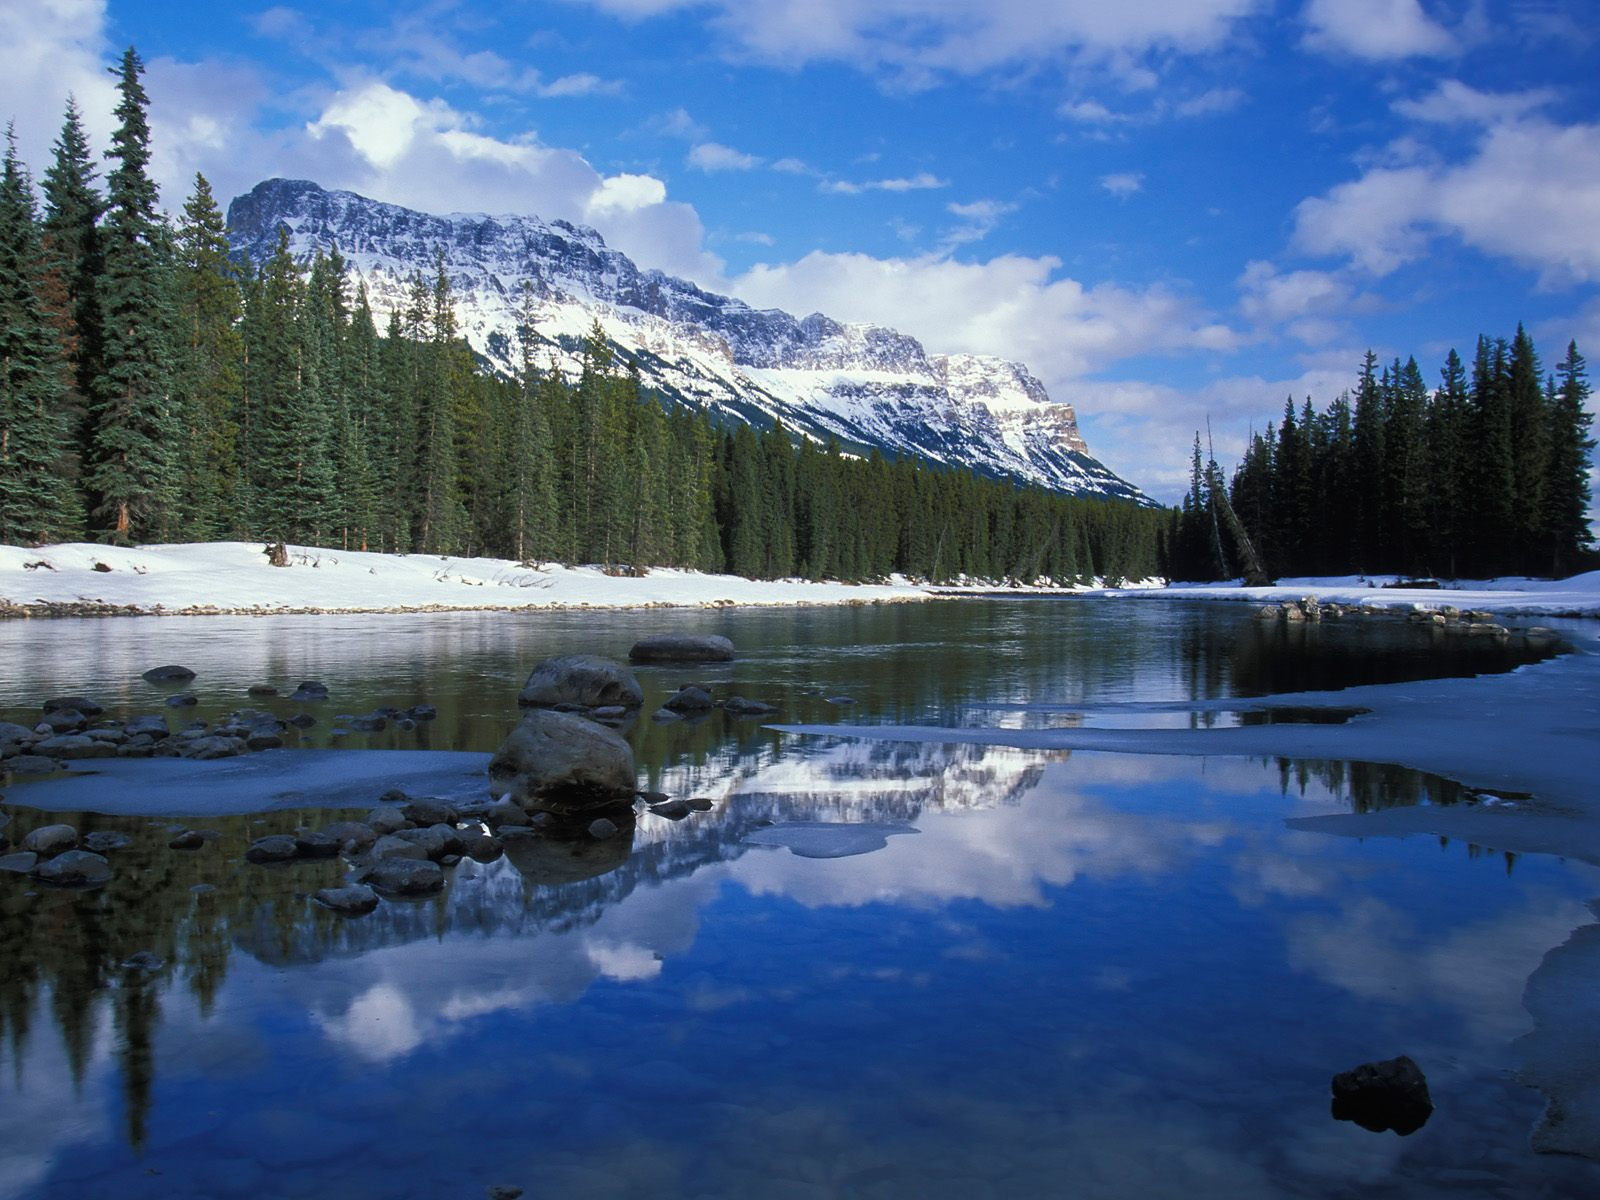 HQ Bow River And Castle Mountain Alberta Canada Wallpaper 1600x1200